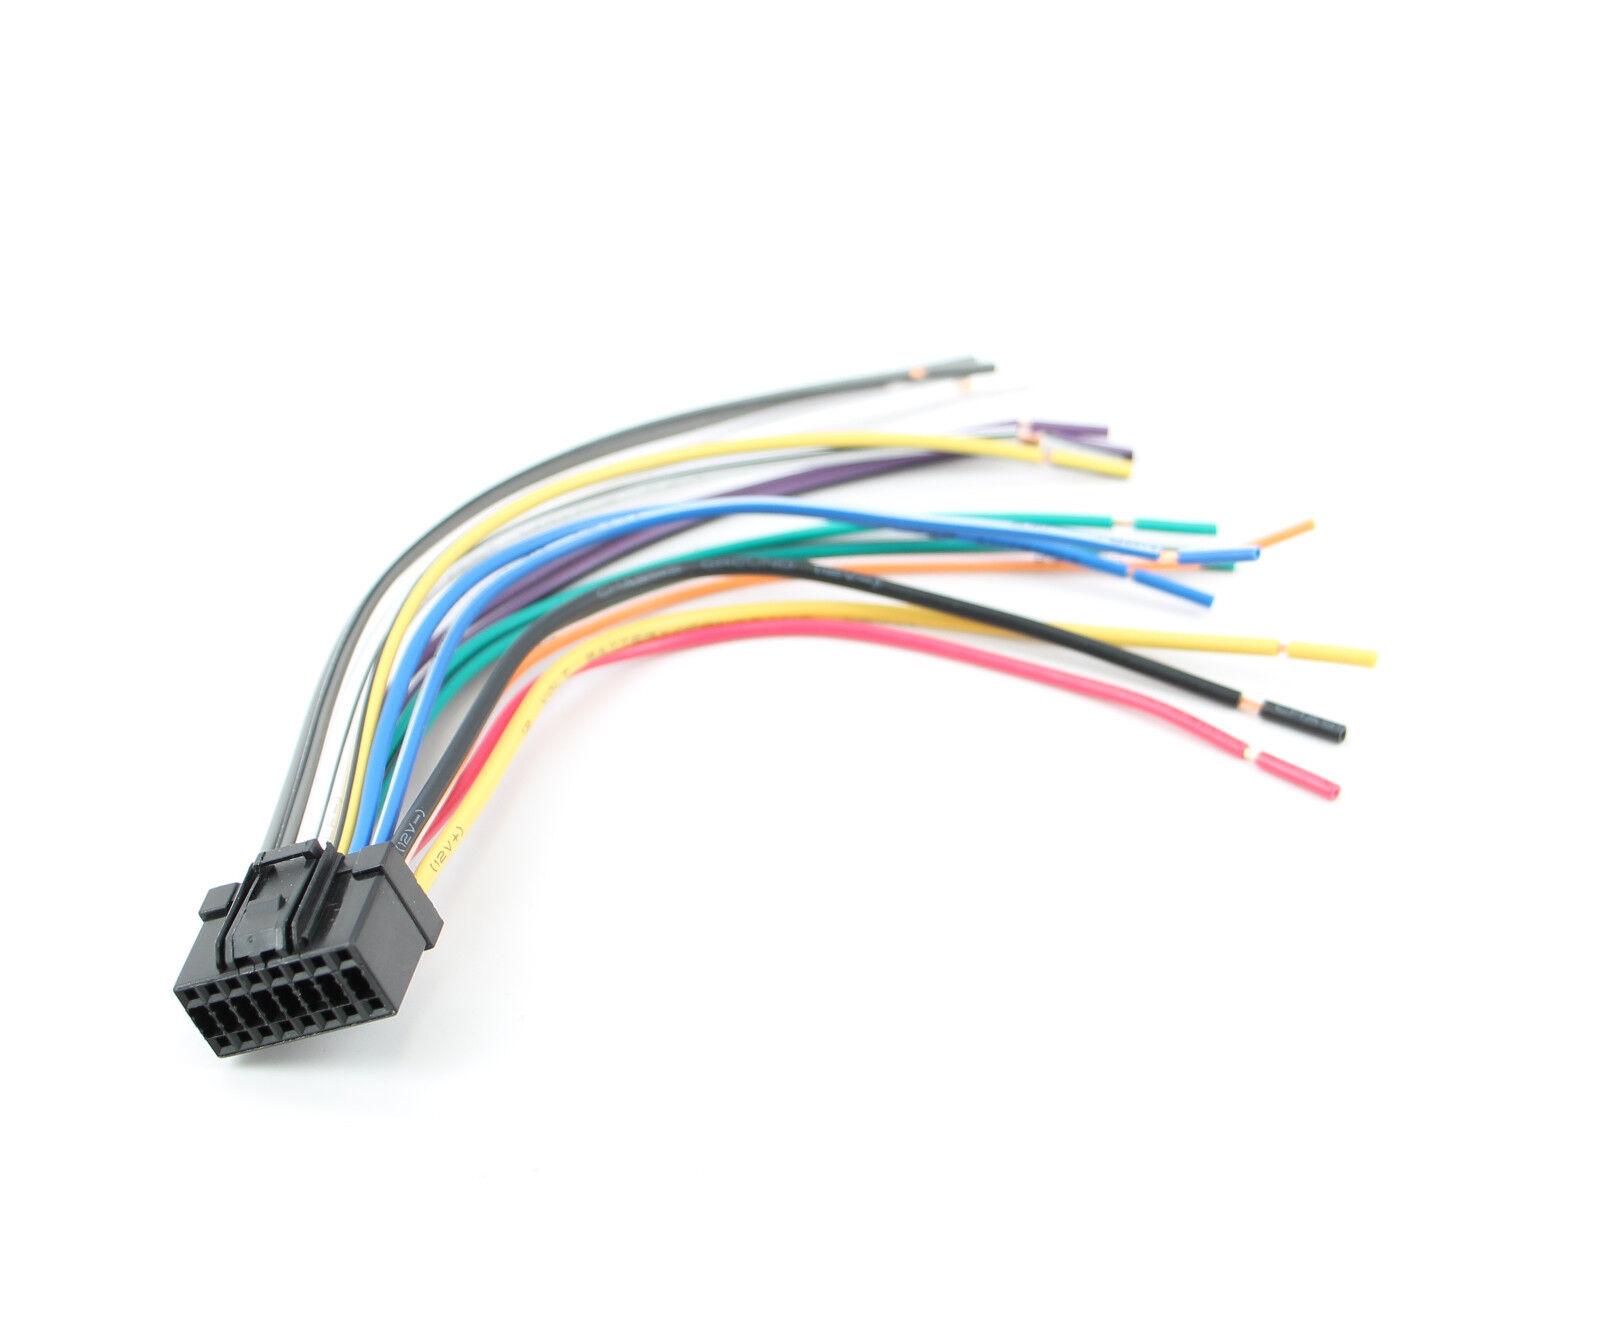 best kit bhpan16a panasonic 16 pin cd player radio head unit wiring rh ebay com Boss Wiring Harness 16 Pins Boss Wiring Harness 16 Pins